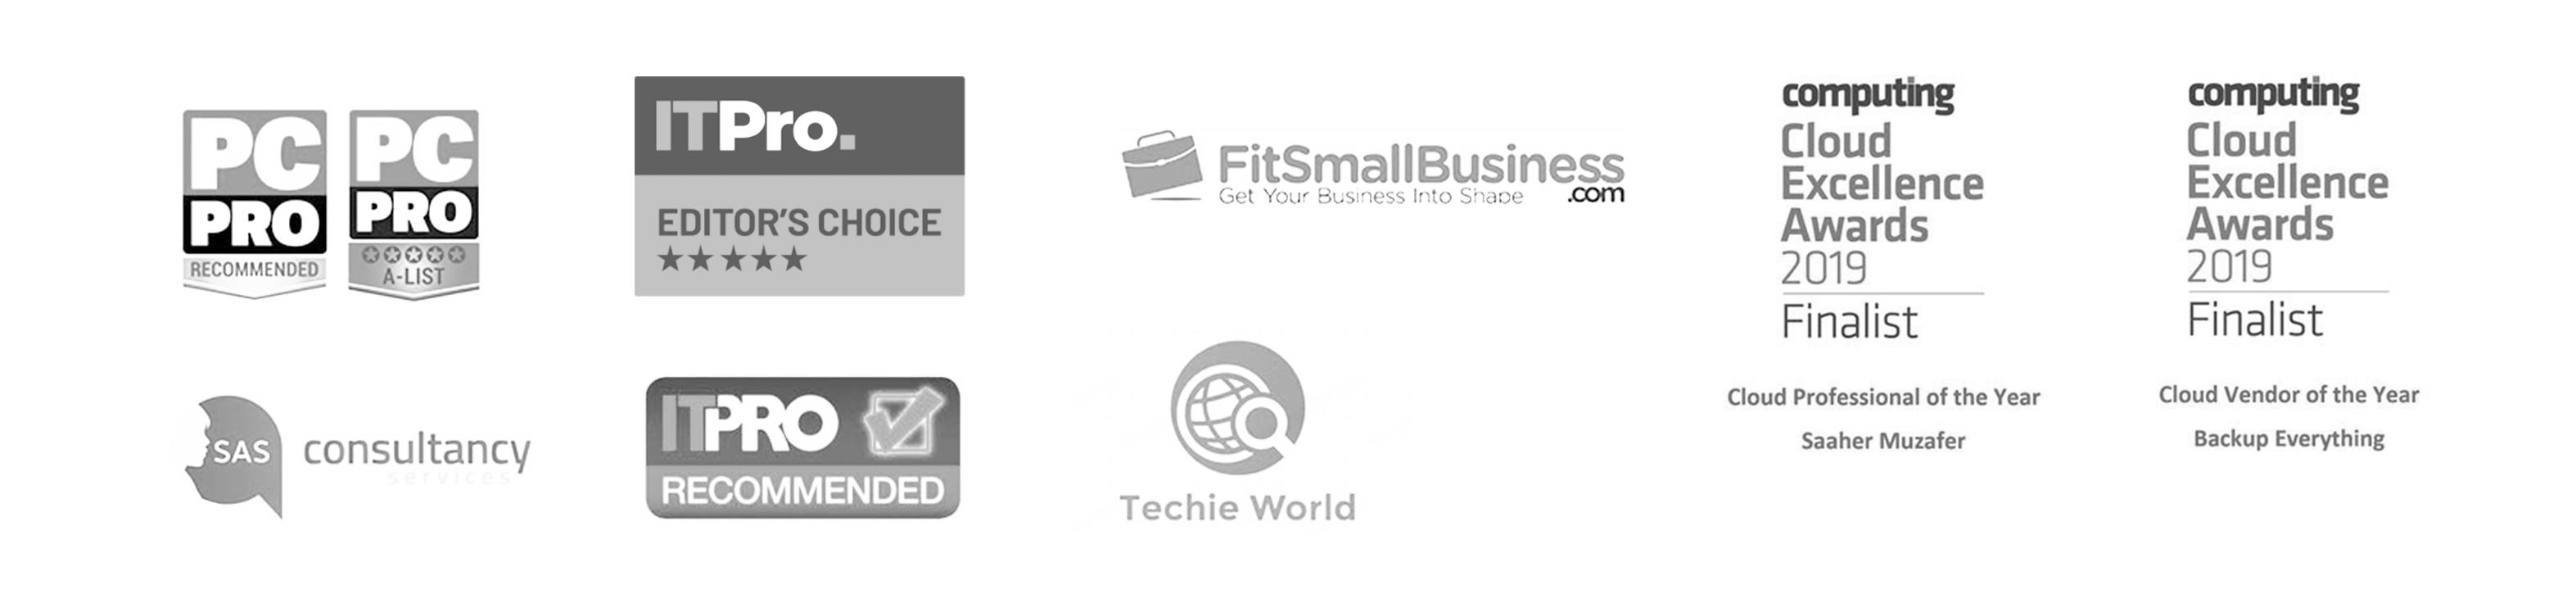 About Us Reviews&Awards Logos